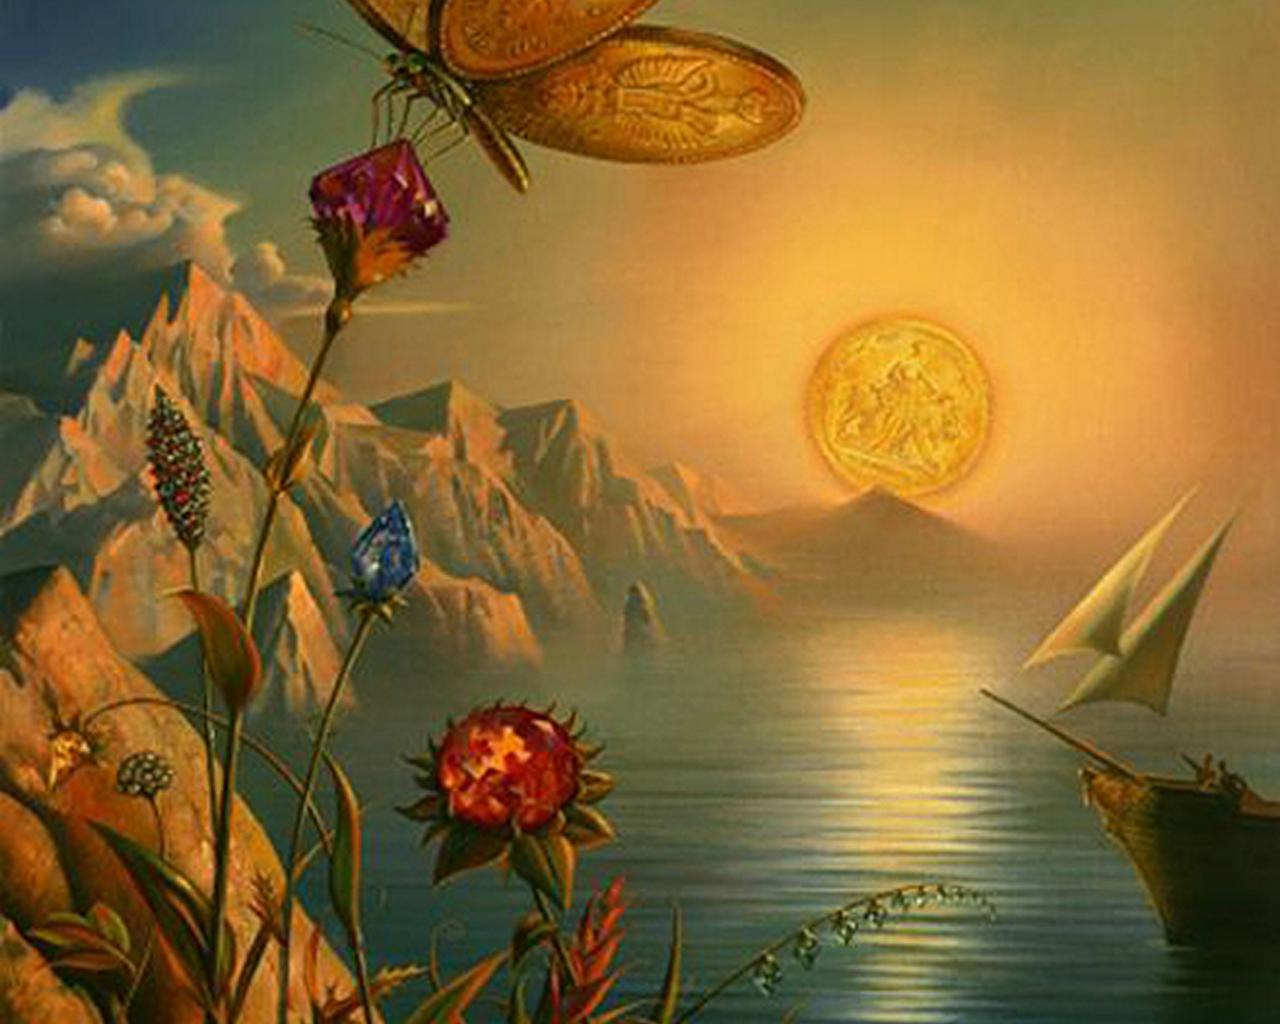 Vladimir Kush Desktop Wallpaper Wallpapers for samsung galaxy 1280x1024